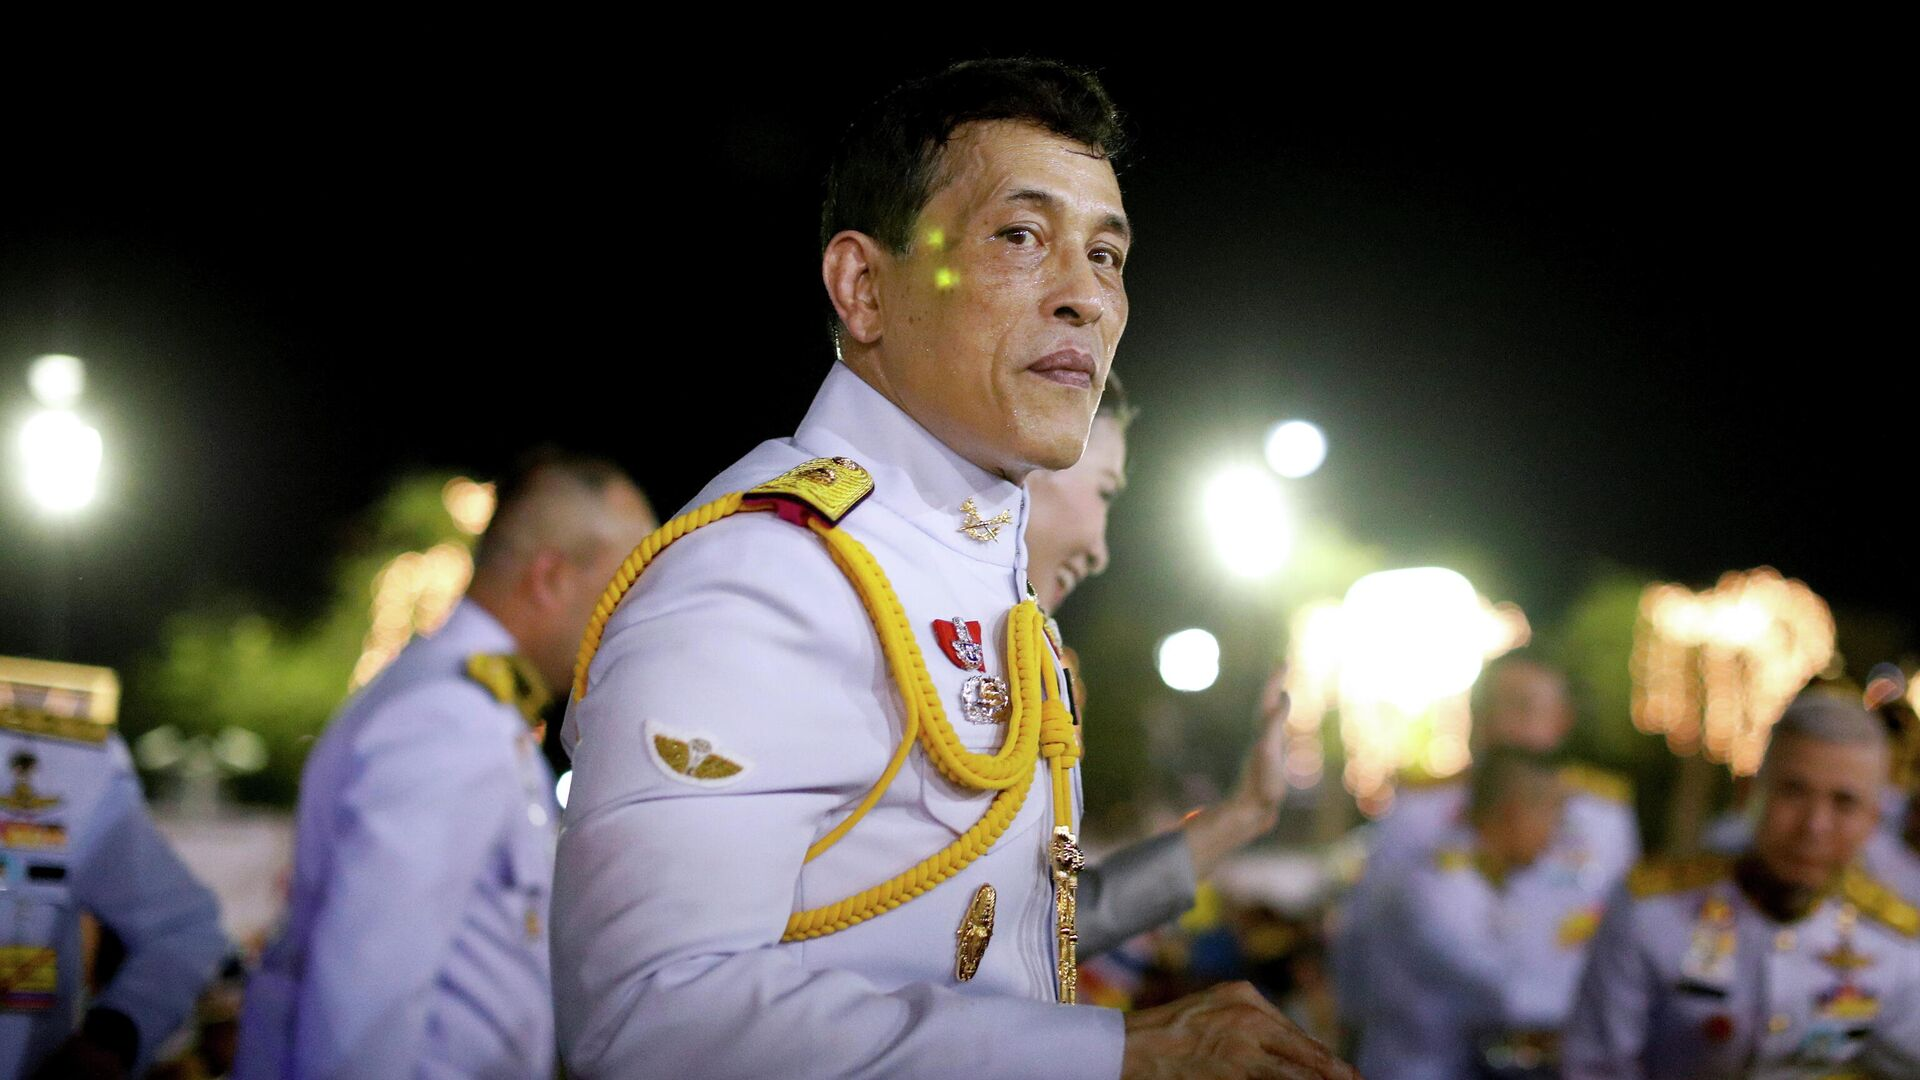 Король Таиланда Маха Ватчиралонгкон (Рама Х) в Бангкоке, Таиланд. 1 ноября 2020 - РИА Новости, 1920, 02.11.2020